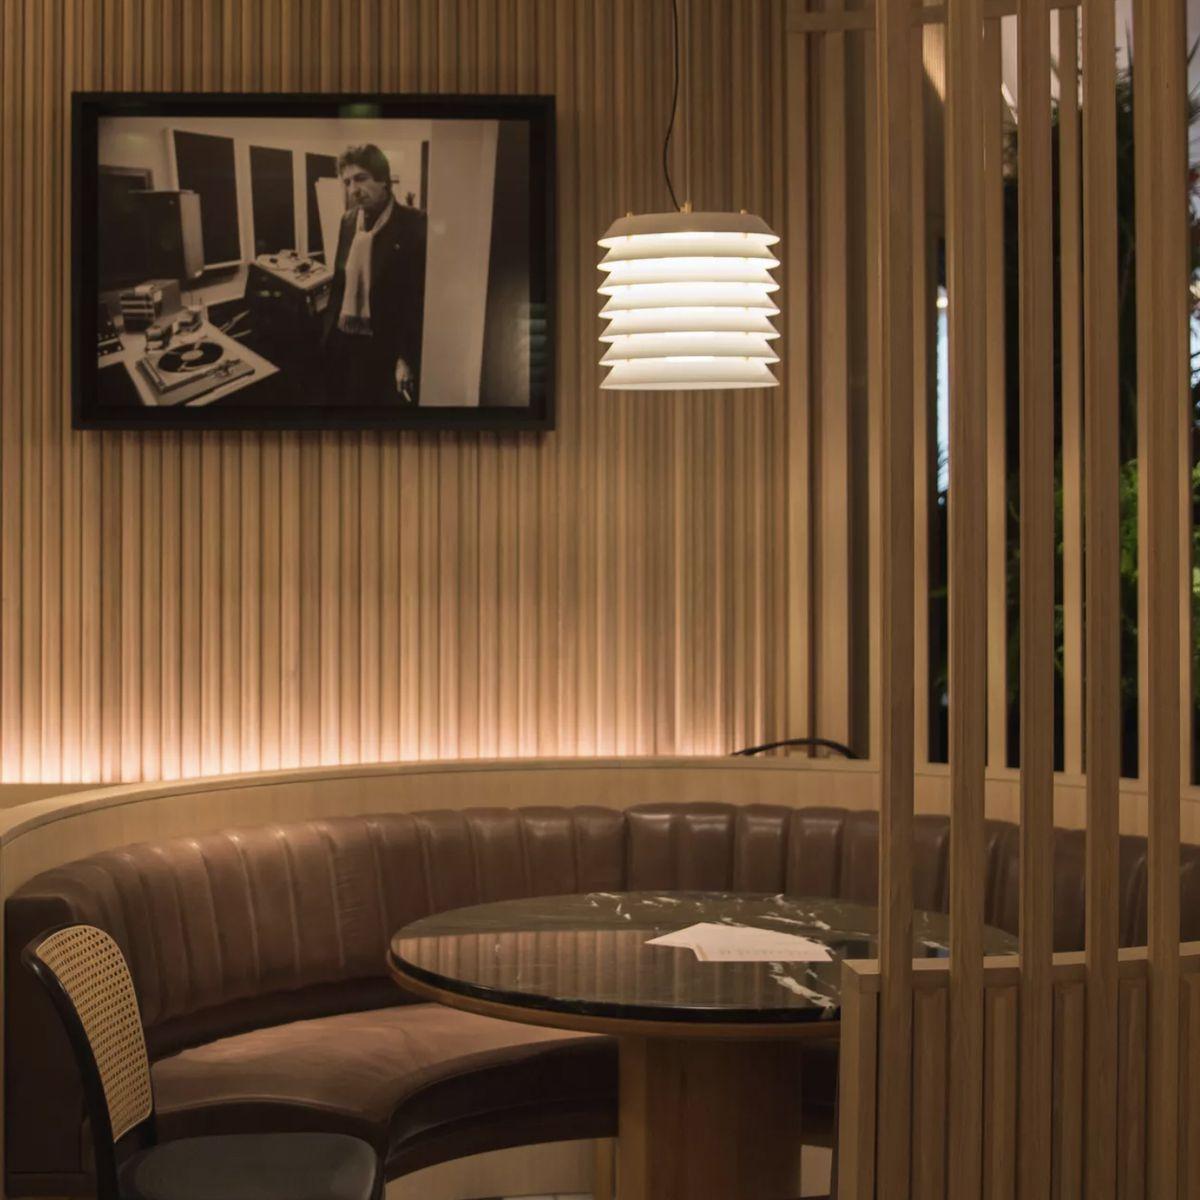 Dimly lit restaurant booth in upscale restaurant